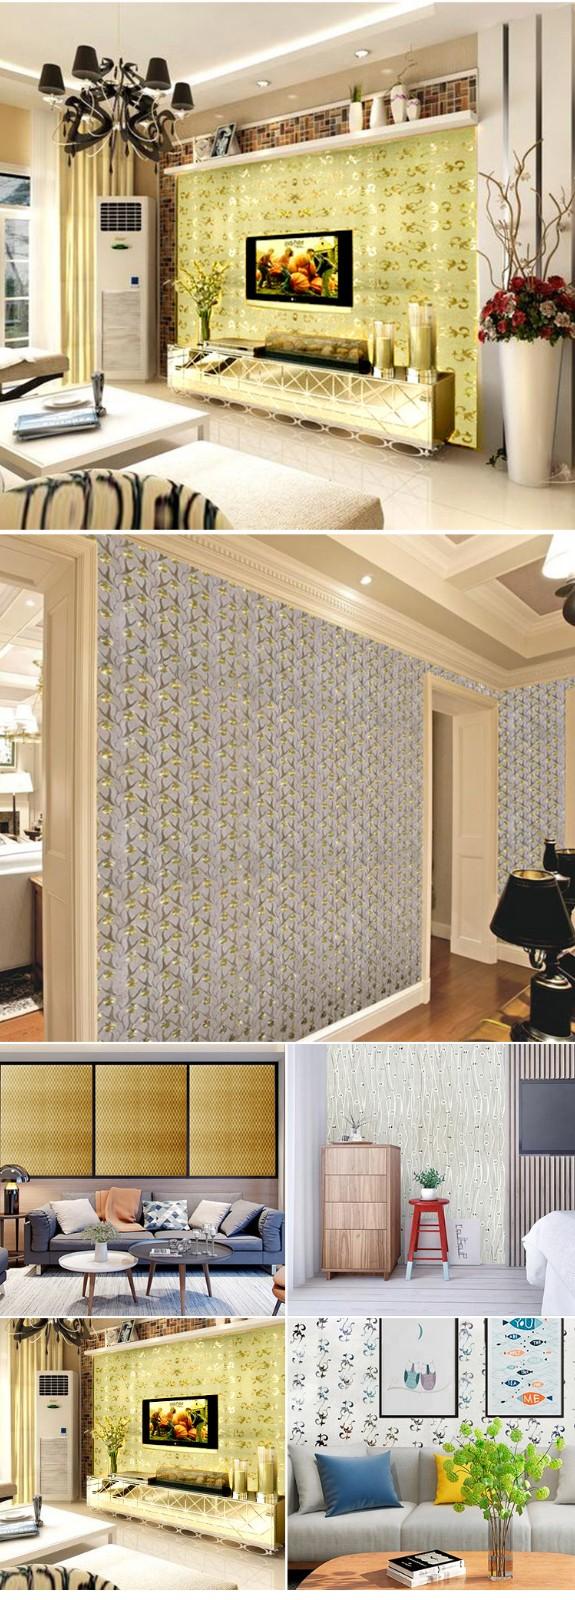 SUNYE kitchen wall backsplash series for sale-6